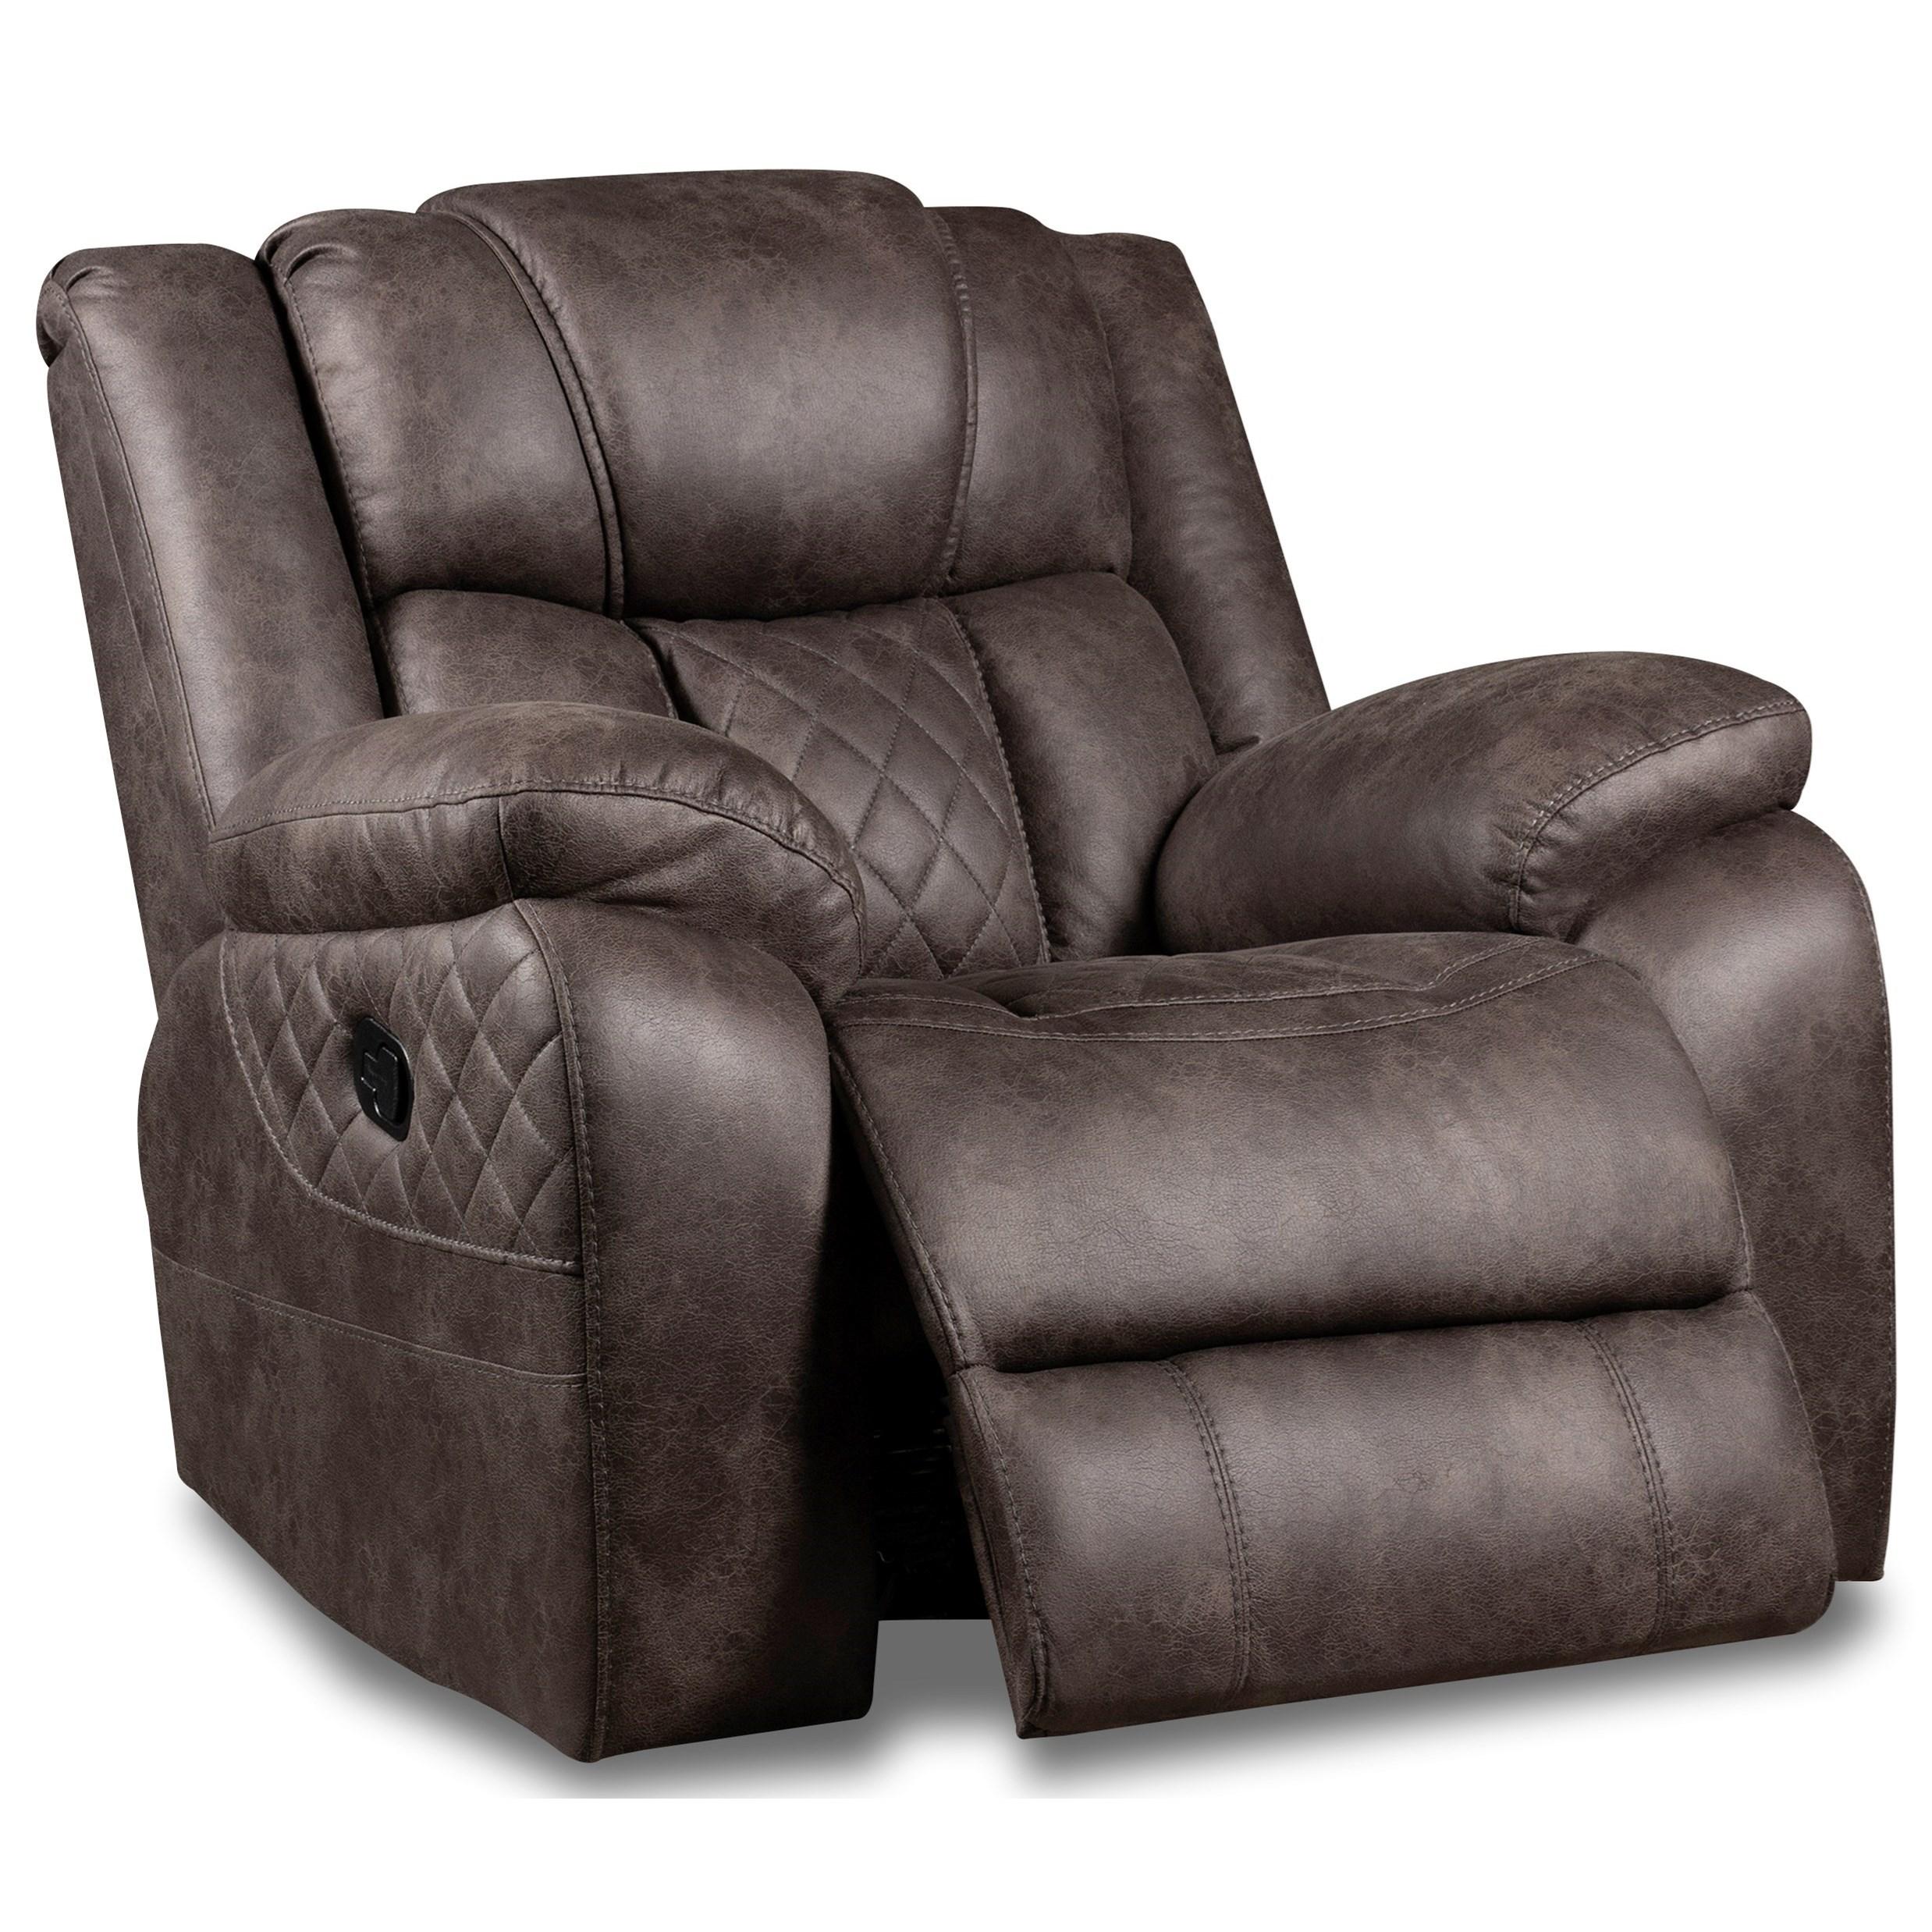 34803 Rocker Recliner by Corinthian at Story & Lee Furniture